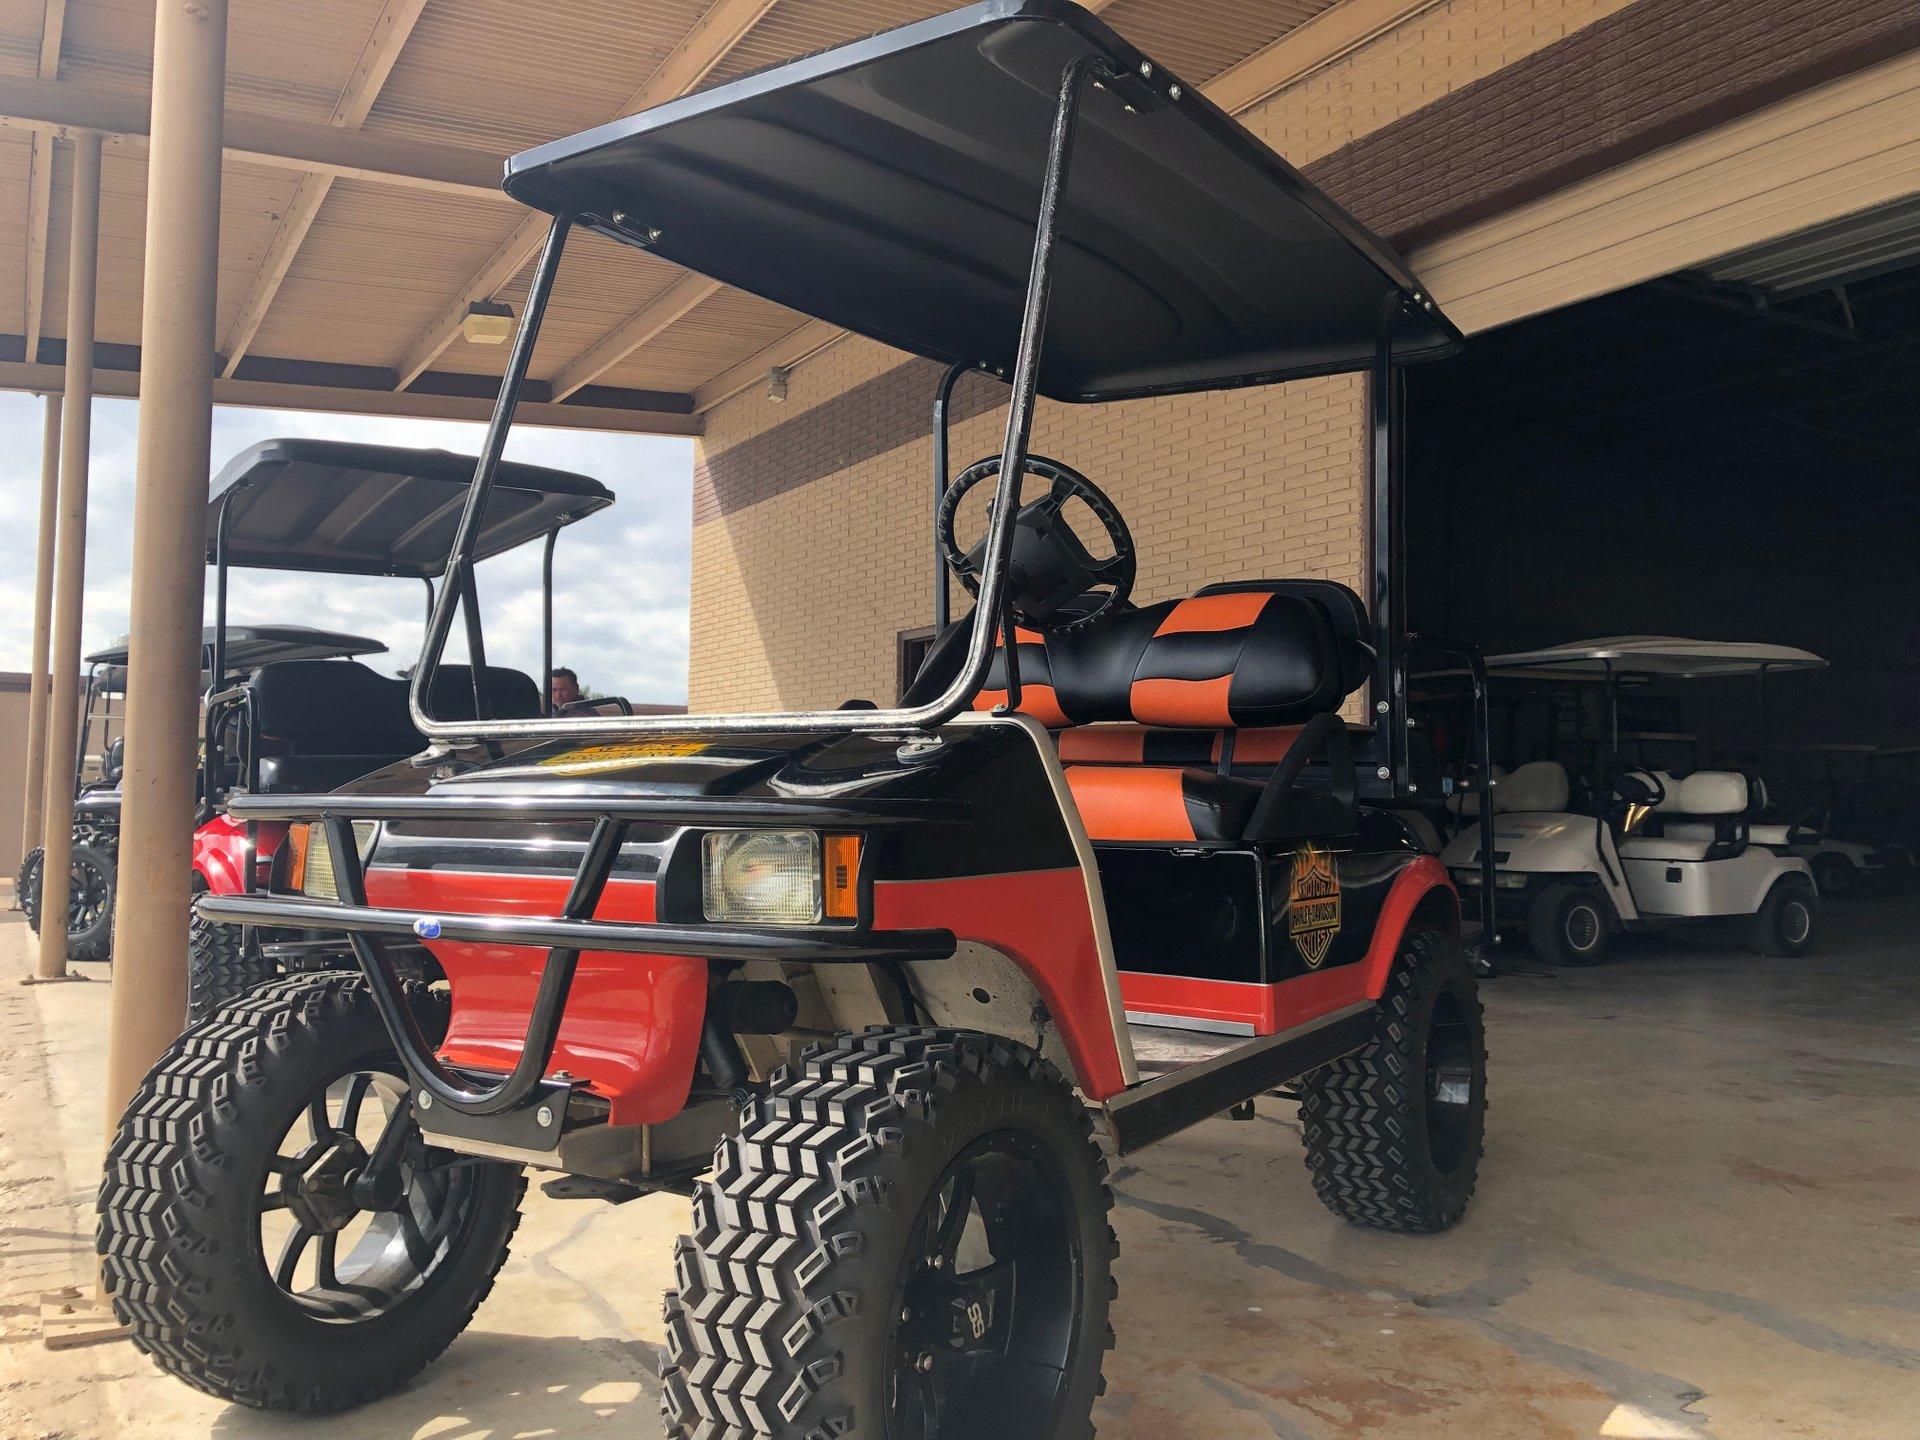 2003 club car custom harley davidson motif golf cart